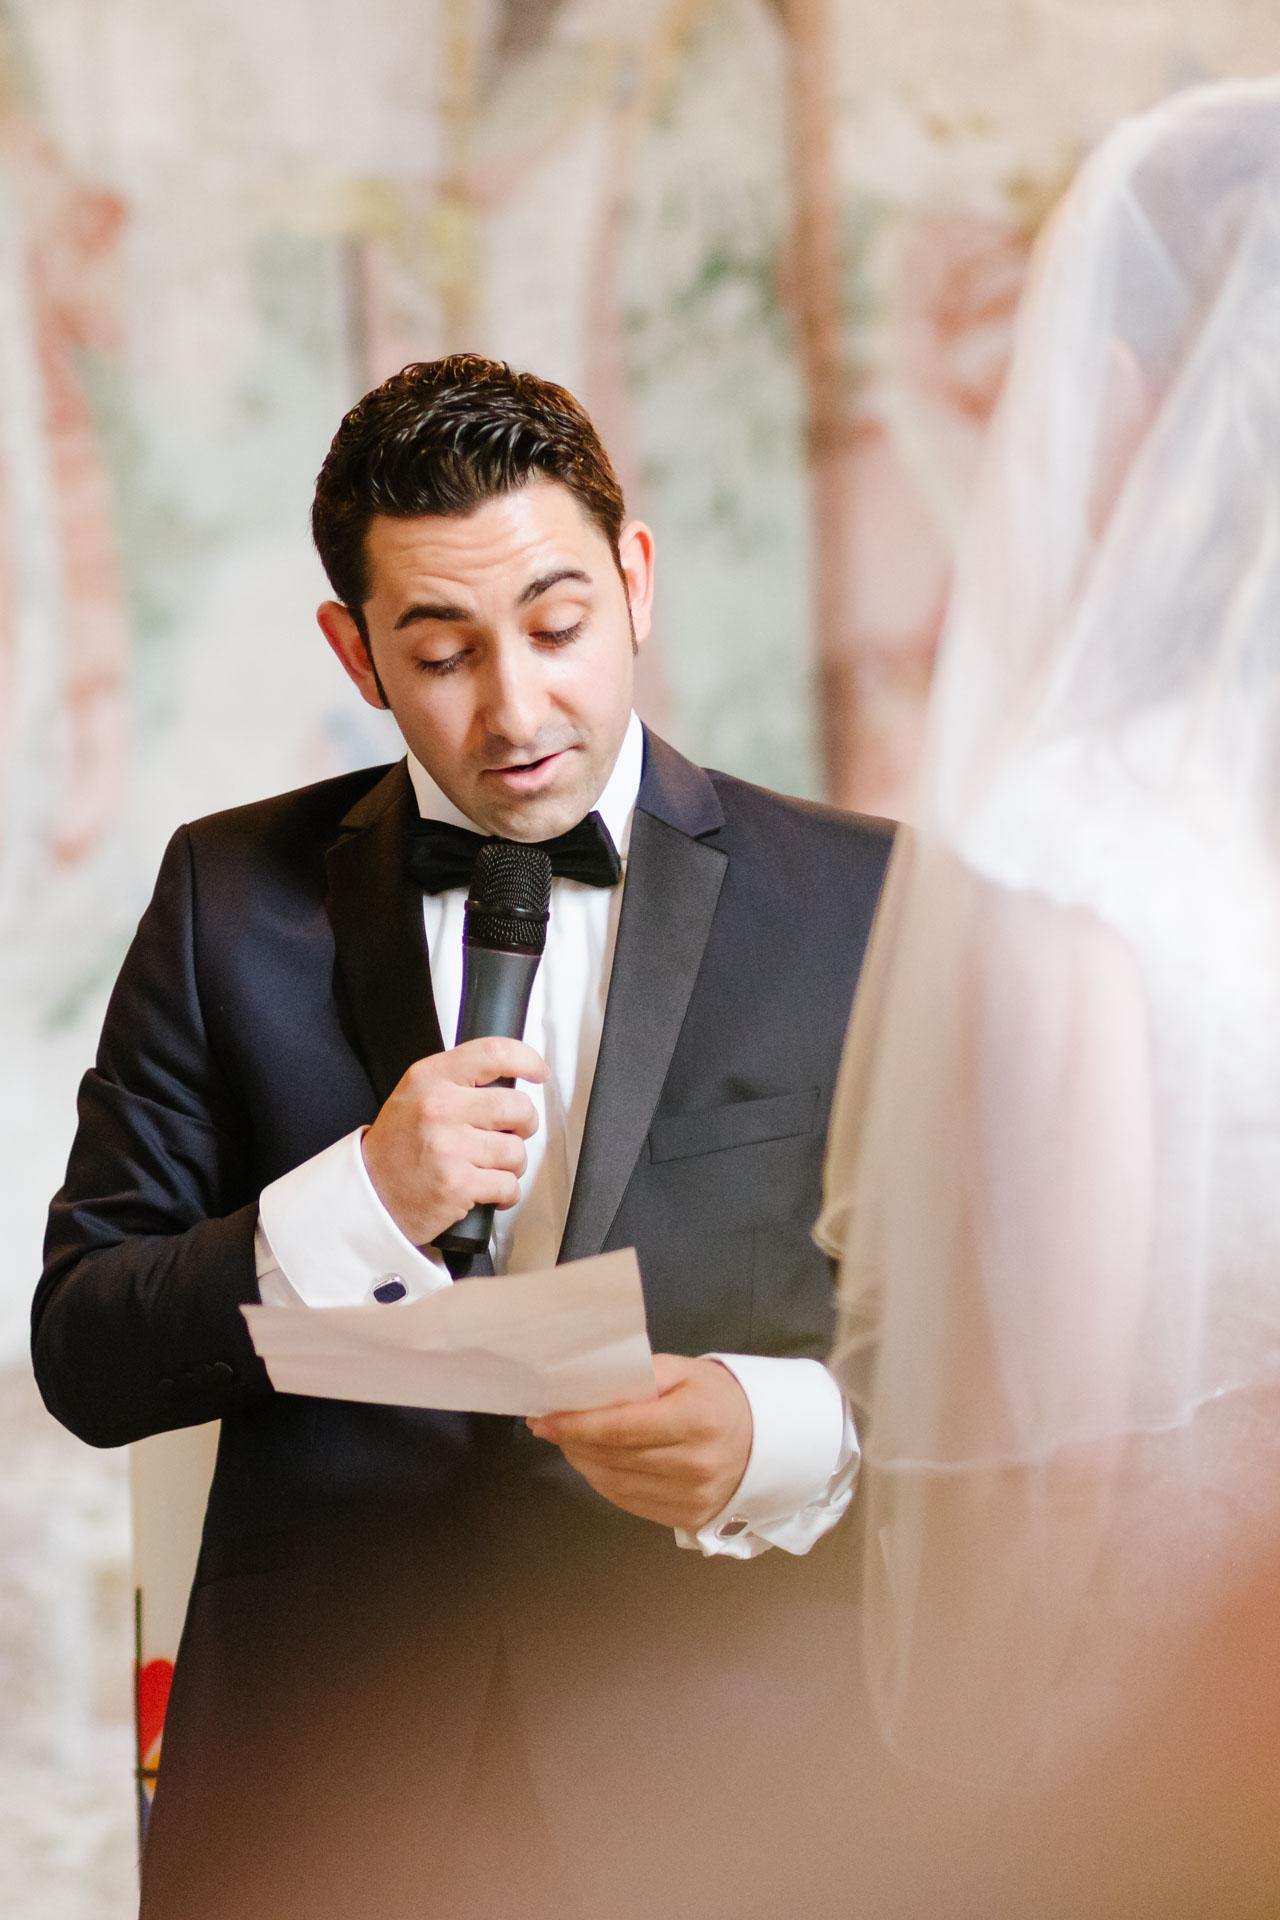 Dana_Michael_Hochzeit_Muttenz_2016-20